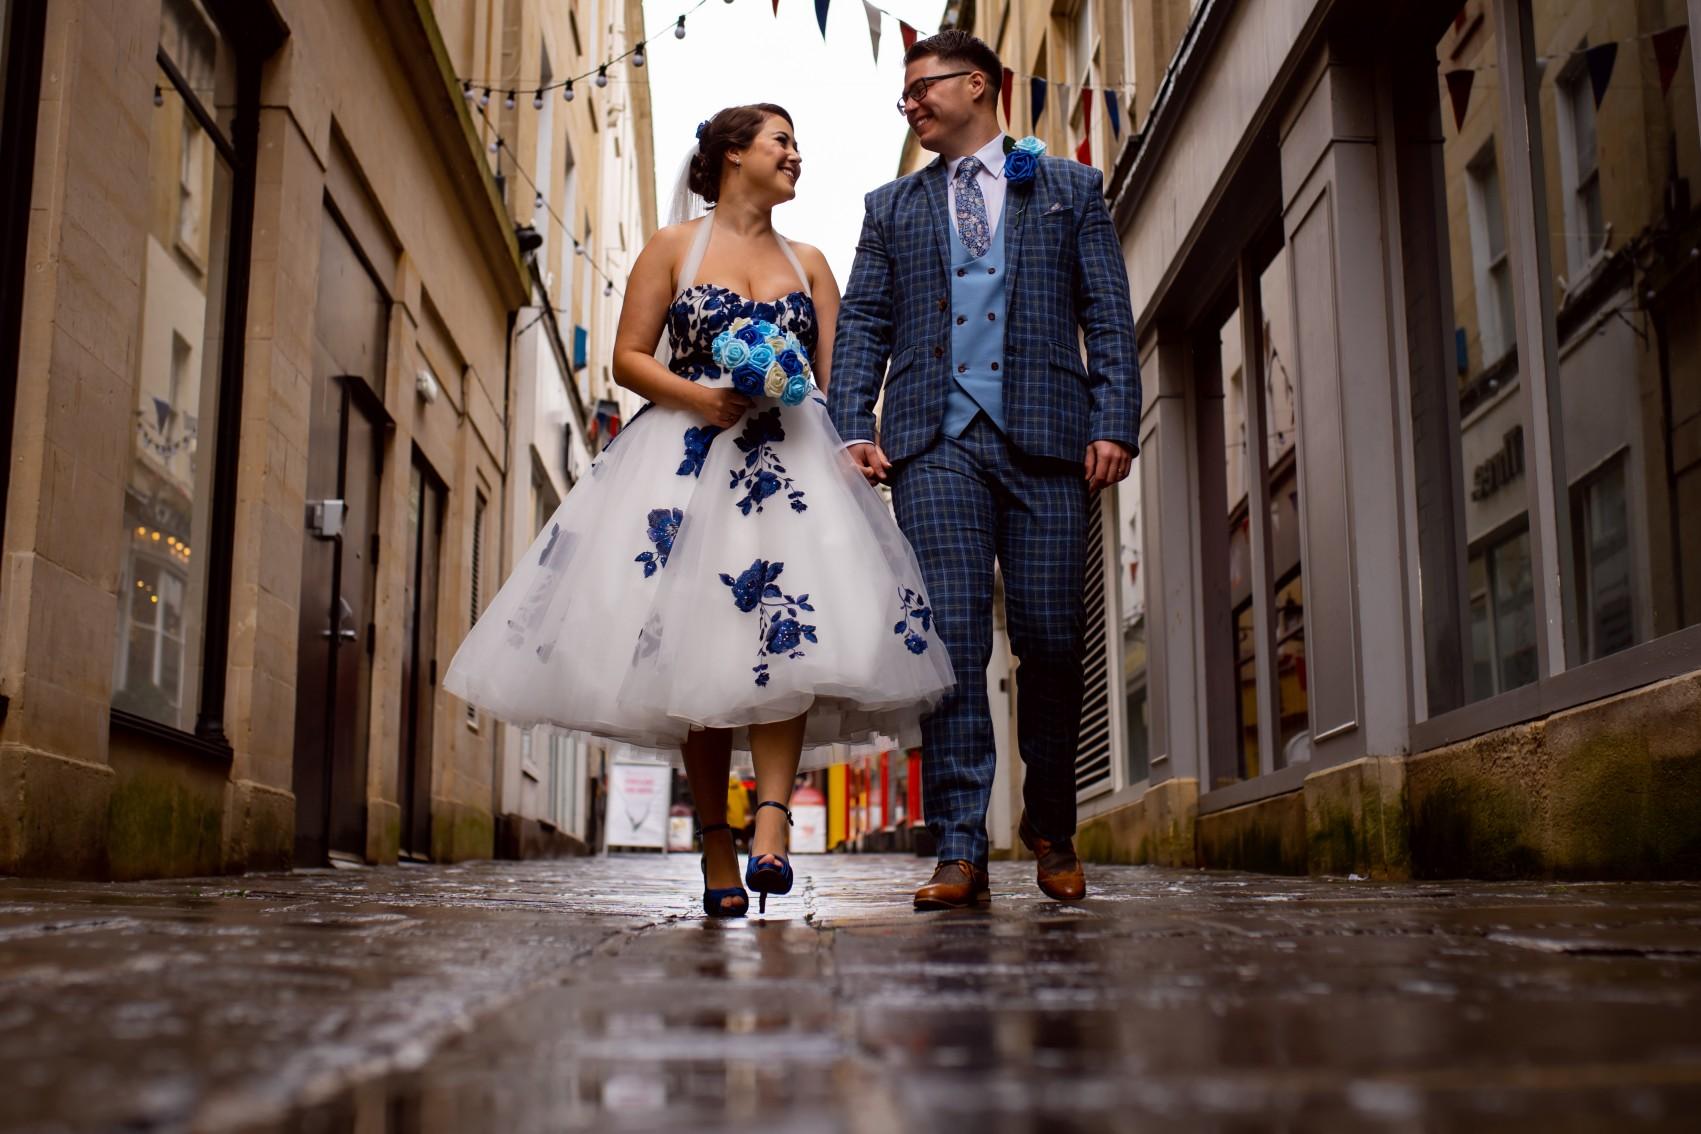 alternative bridal wear - tea length wedding dress with blue flowers - alternative wedding wear